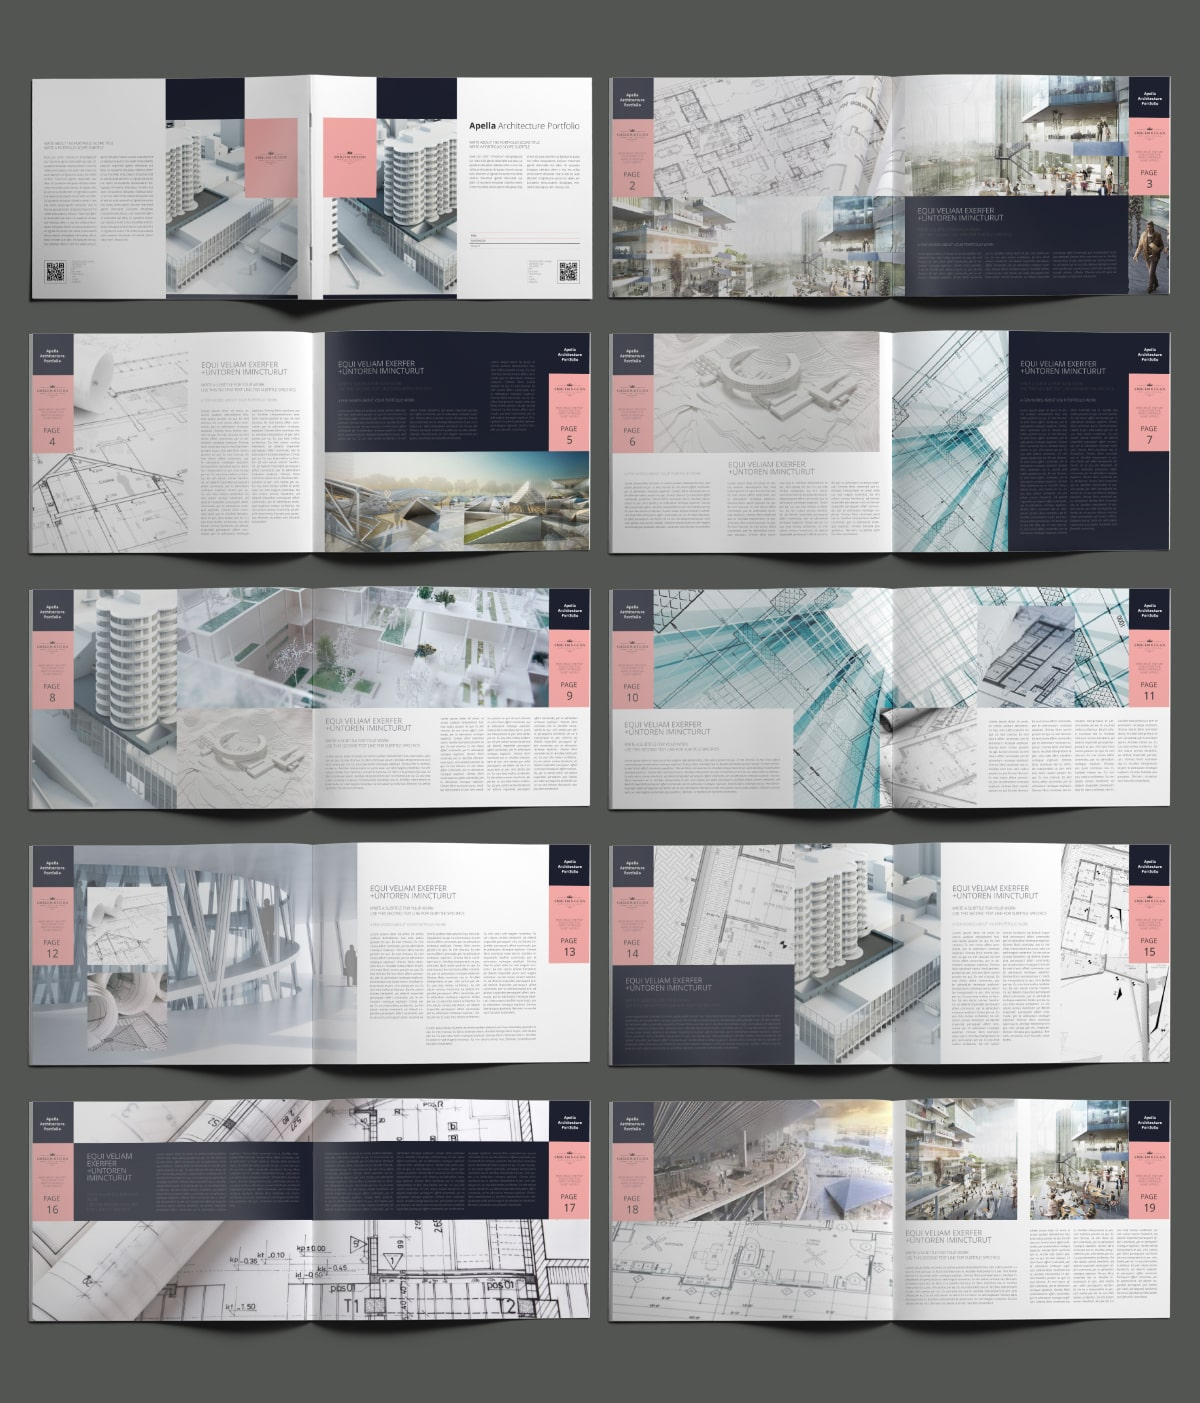 Apella Architecture Portfolio US Letter Landscape - Layouts